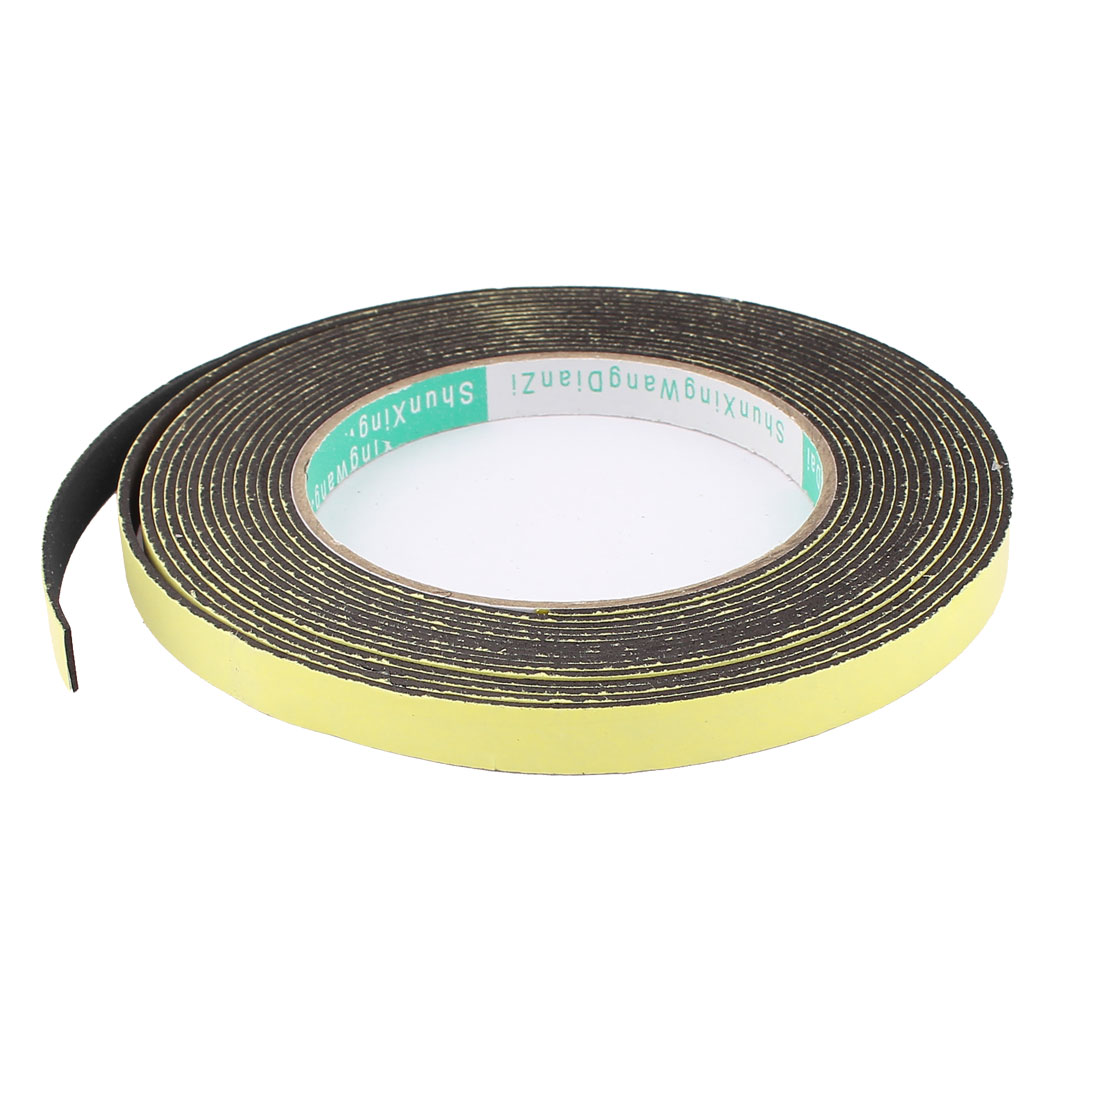 5M 10mm x 1.5mm Single Side Adhesive Foam Sealing Tape for Door Window